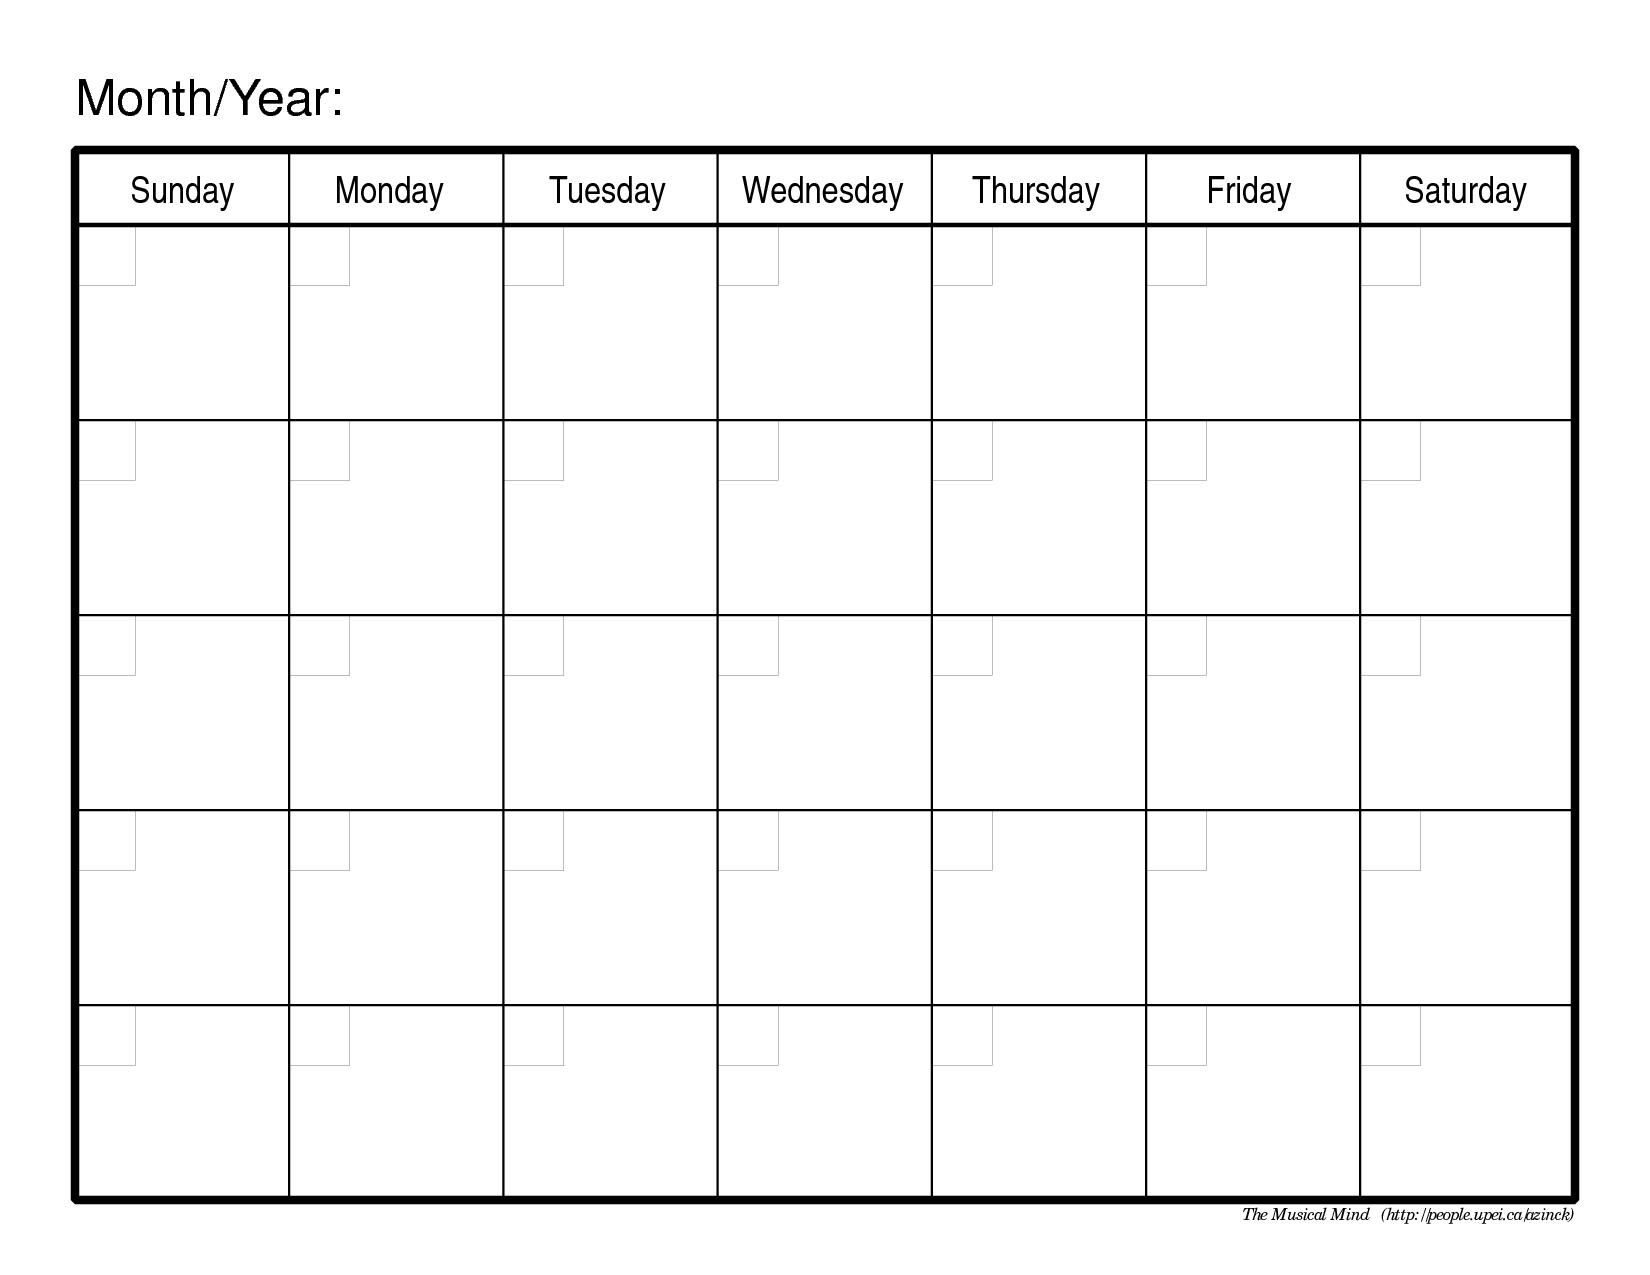 Get Blank Calendar To Fill In